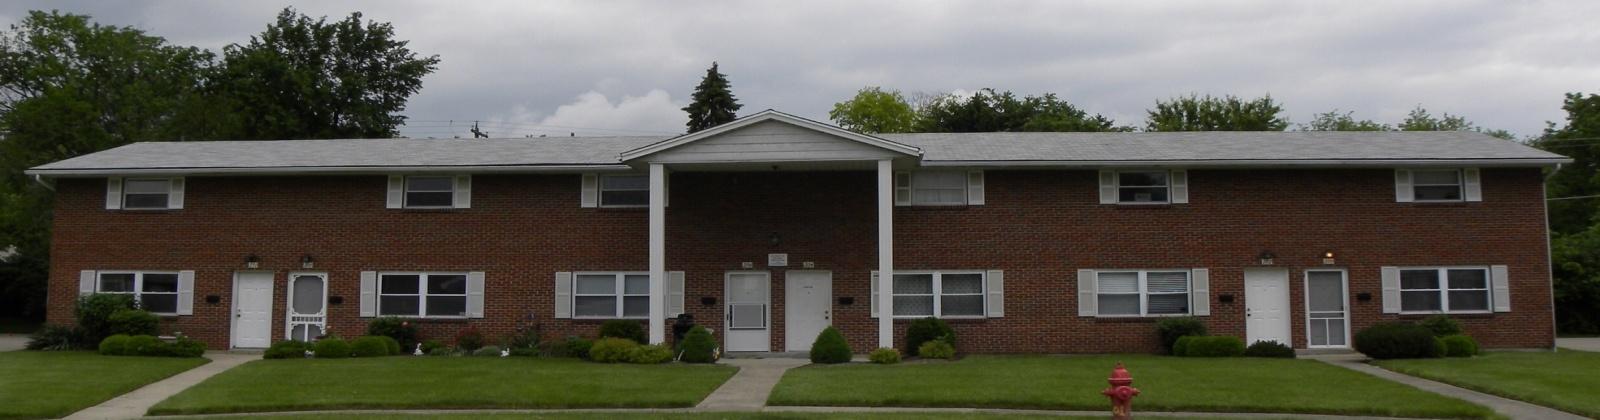 Ohio,2 Bedrooms Bedrooms,1 BathroomBathrooms,Apartment,1008